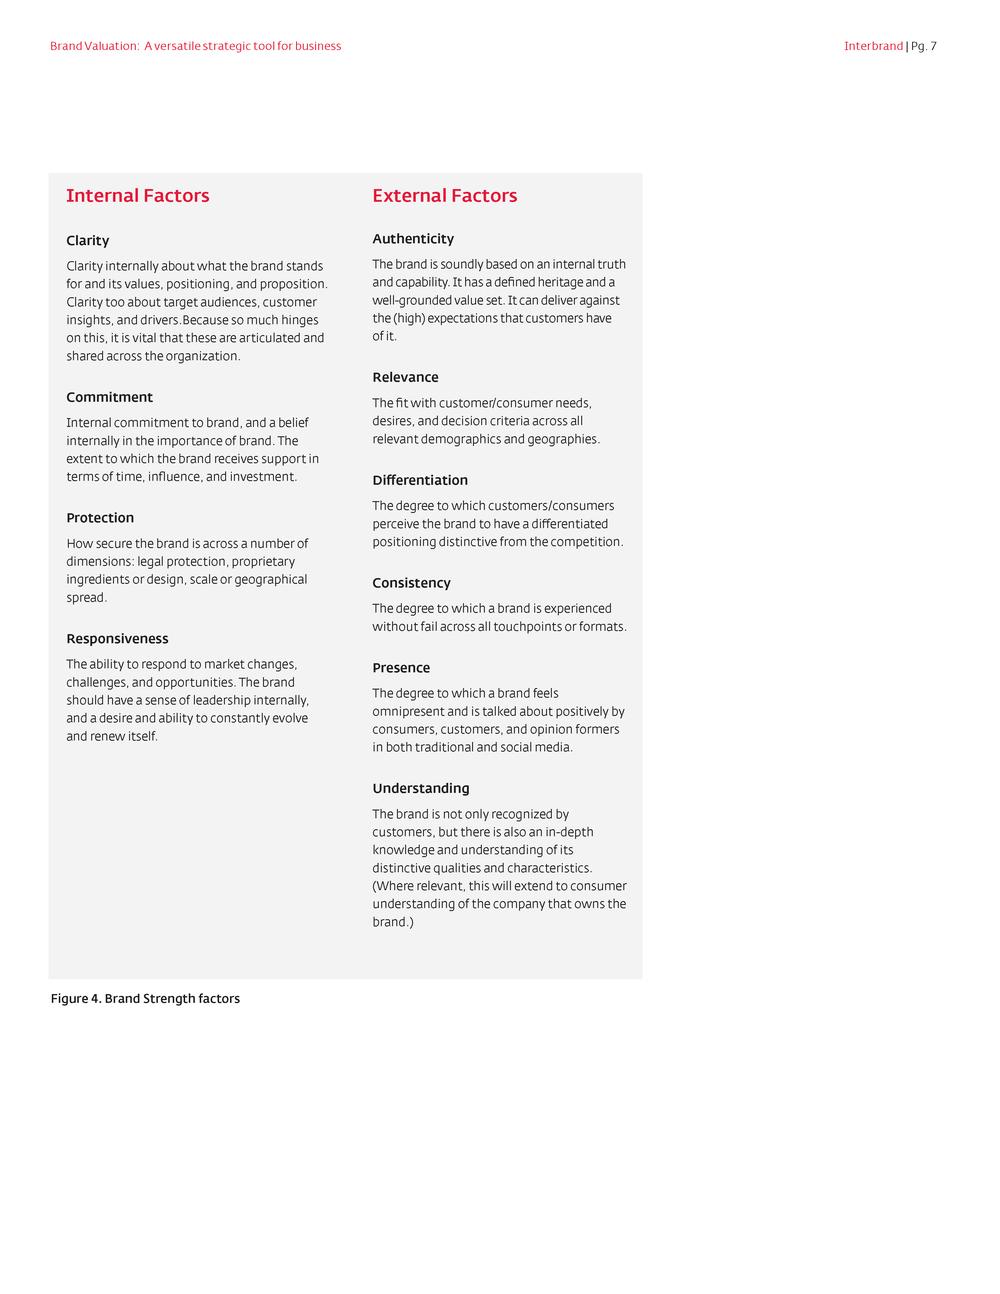 brandvaluation-7.jpg